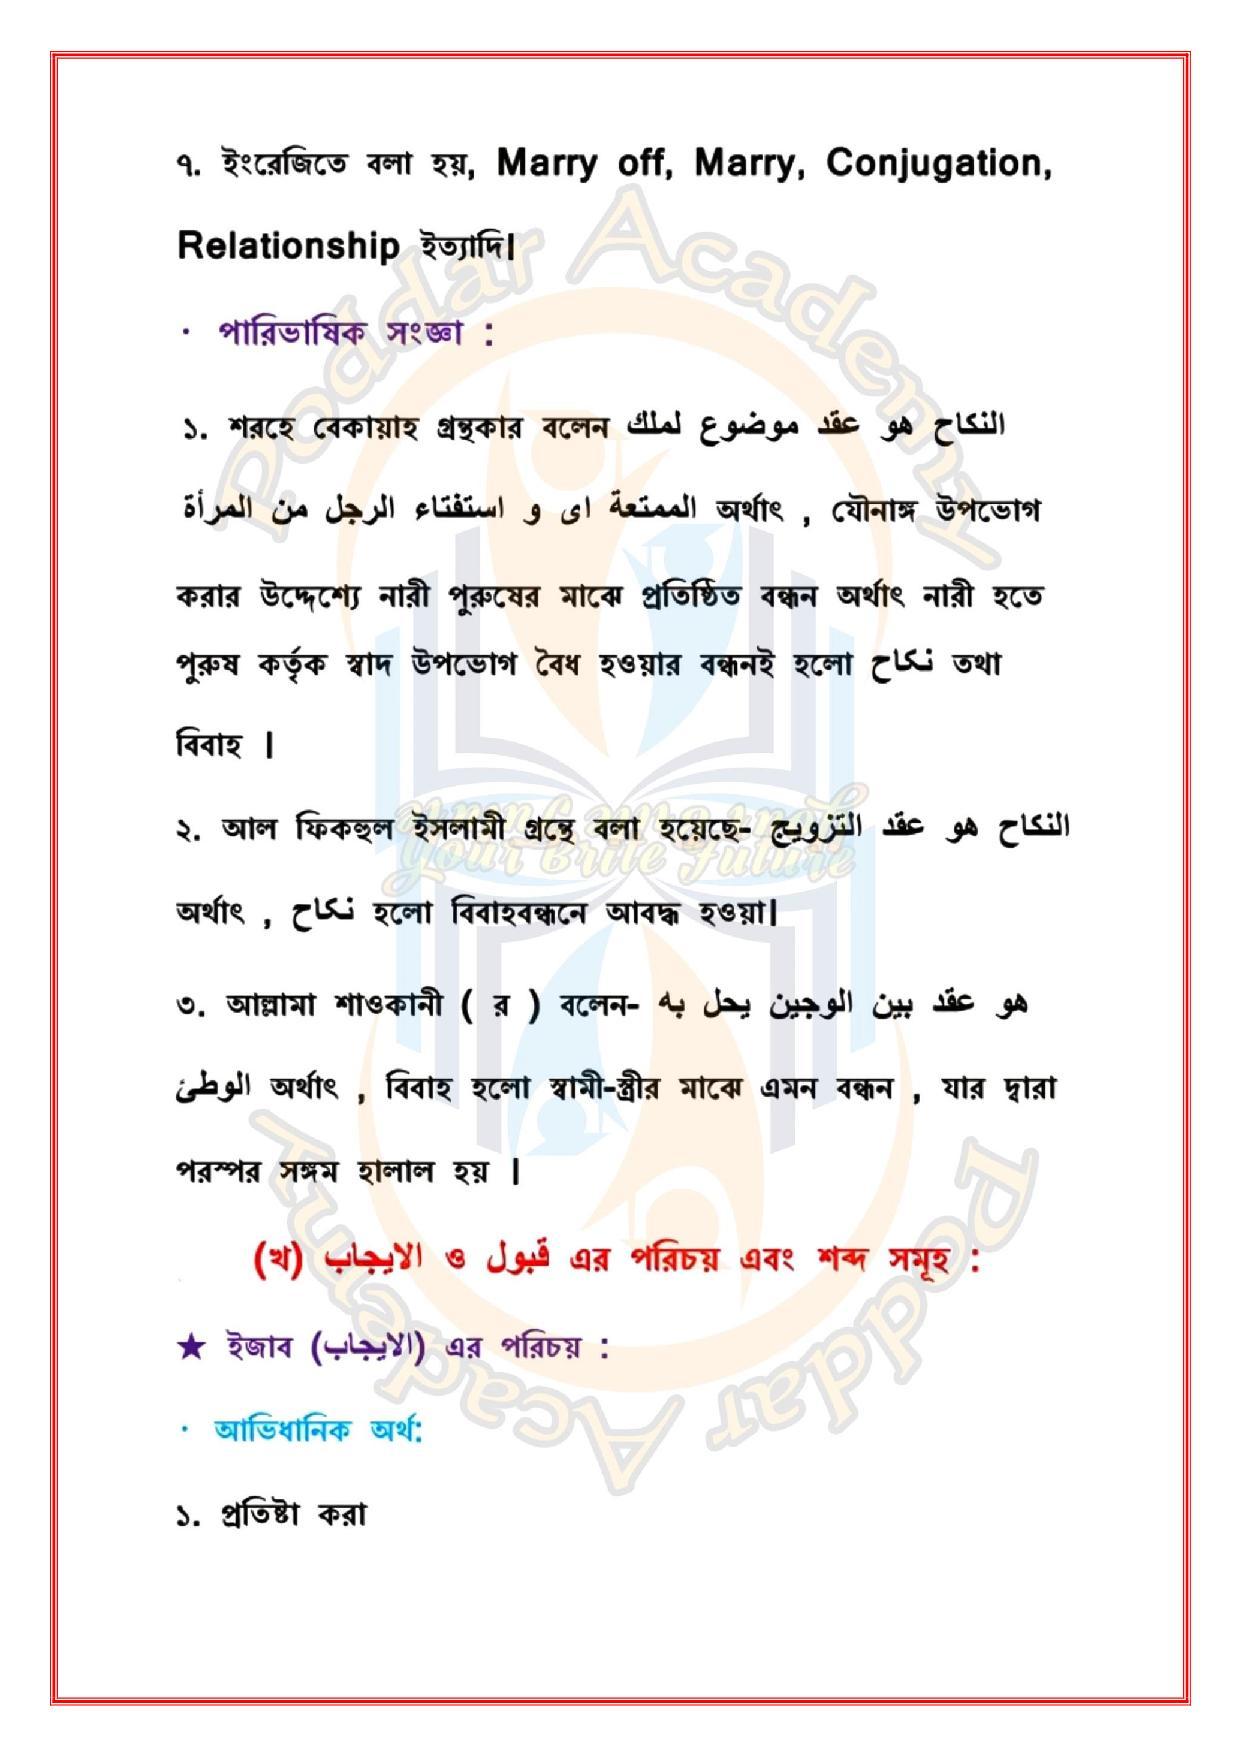 alim al fiqh 1st paper 7th week assignment answer 2021, Alim (hsc) পরিক্ষার্থী ২০২১ এর আল ফিকহ ১ম পত্র ৭ম সপ্তাহের অ্যাসাইনমেন্ট উত্তর / সমাধান ২০২১ https://www.banglanewsexpress.com/